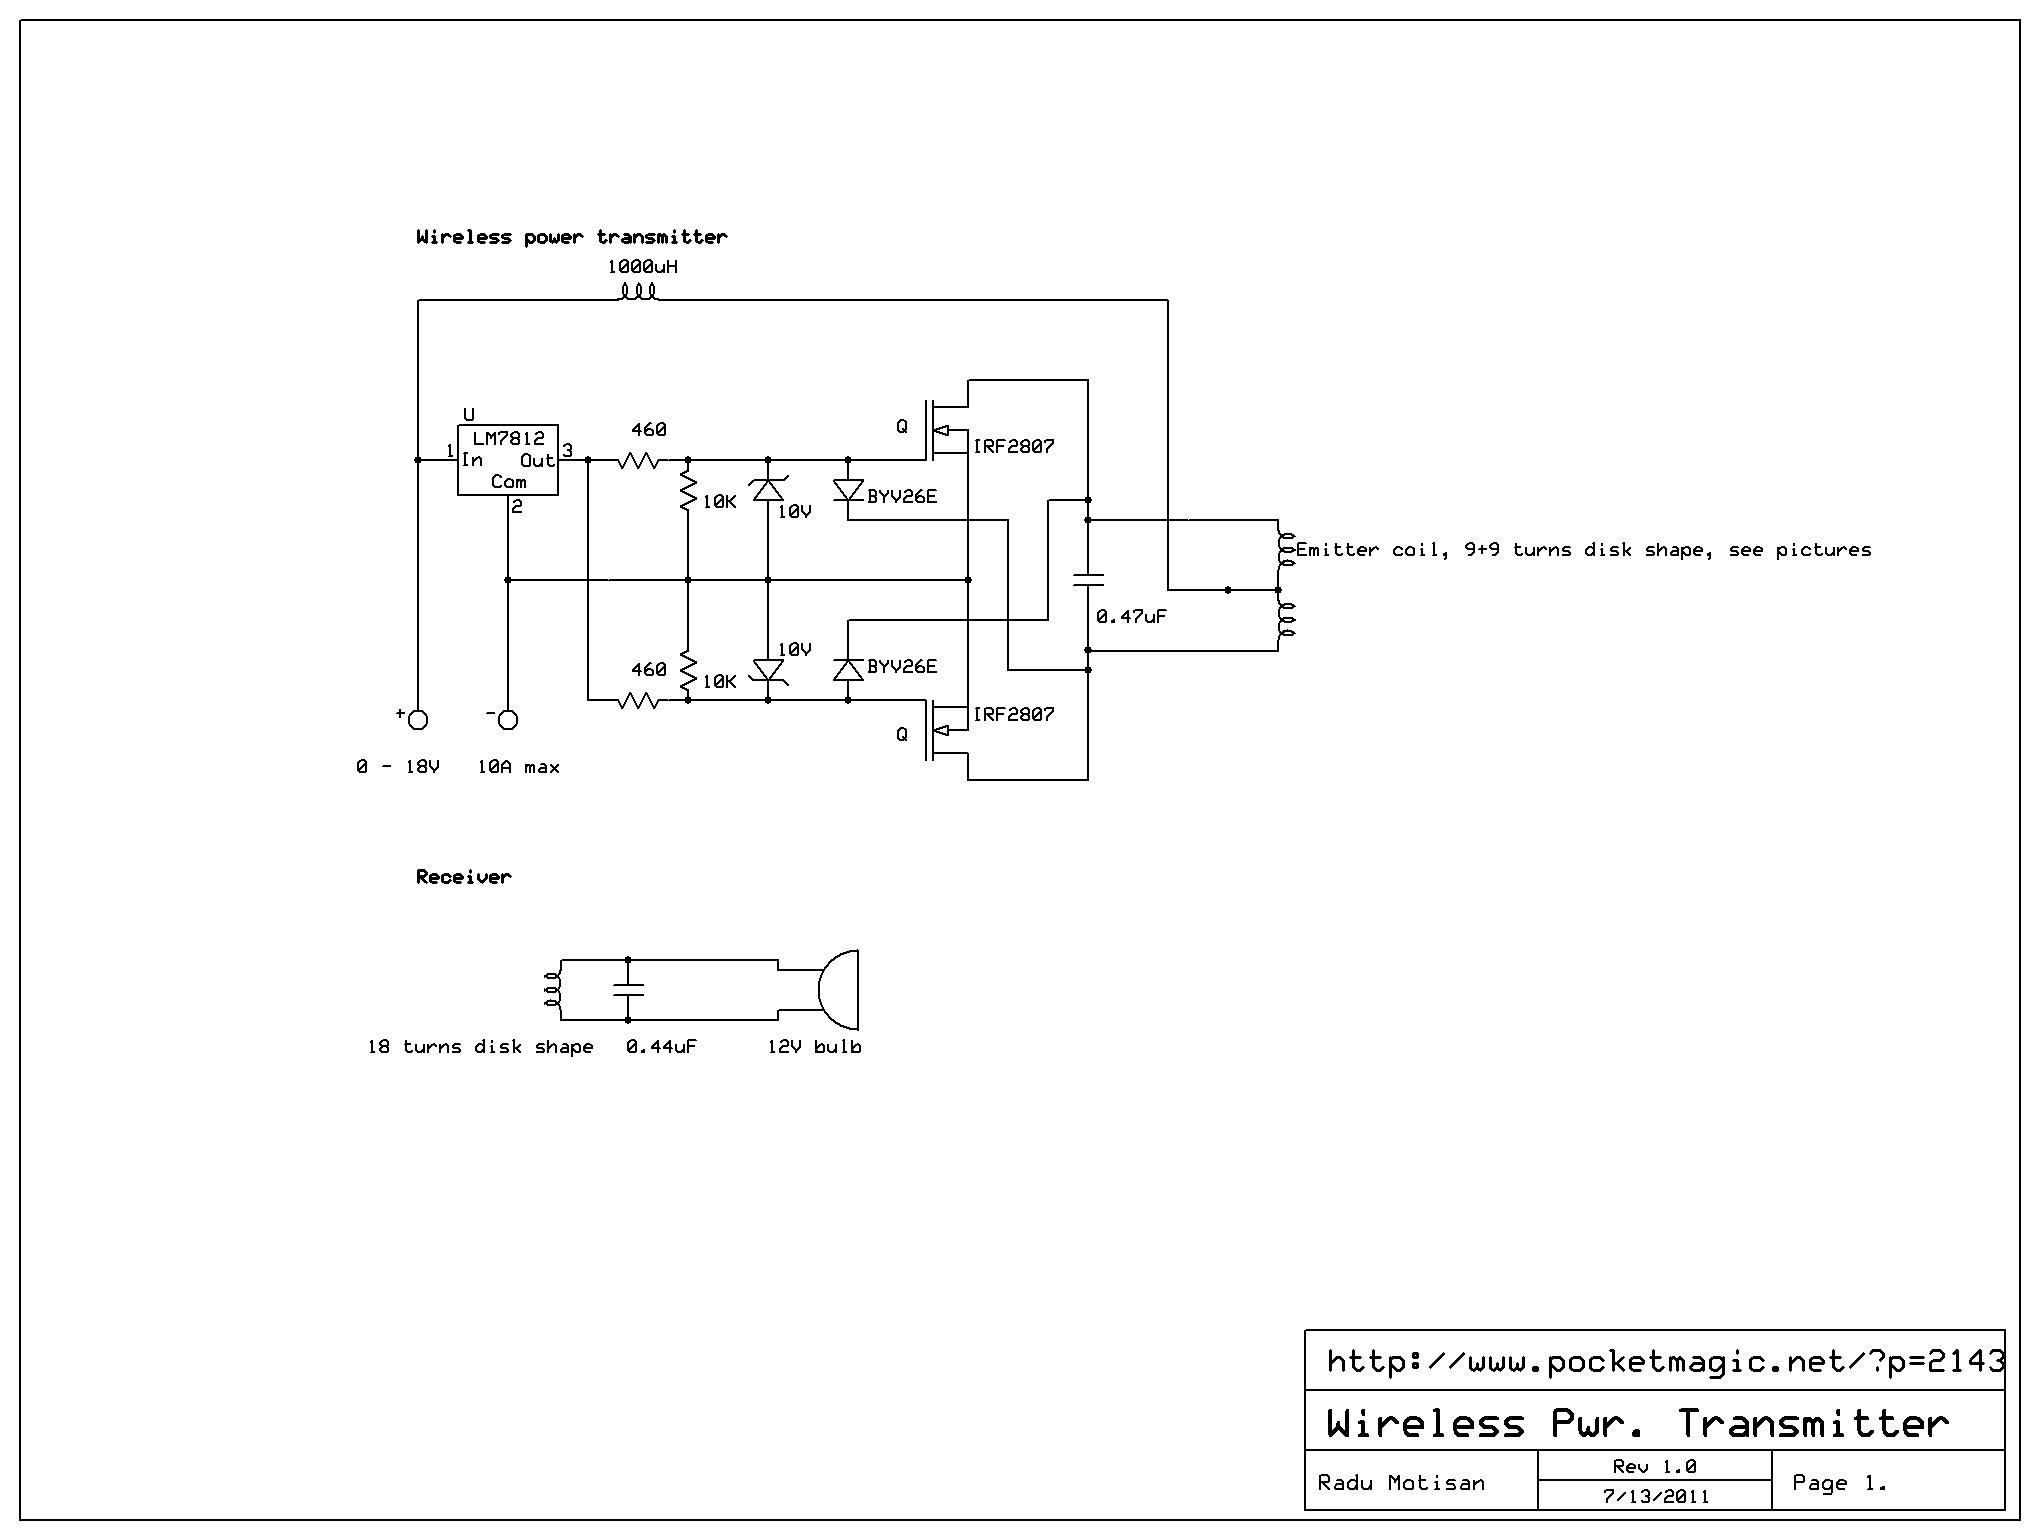 Wireless Power Transmitter